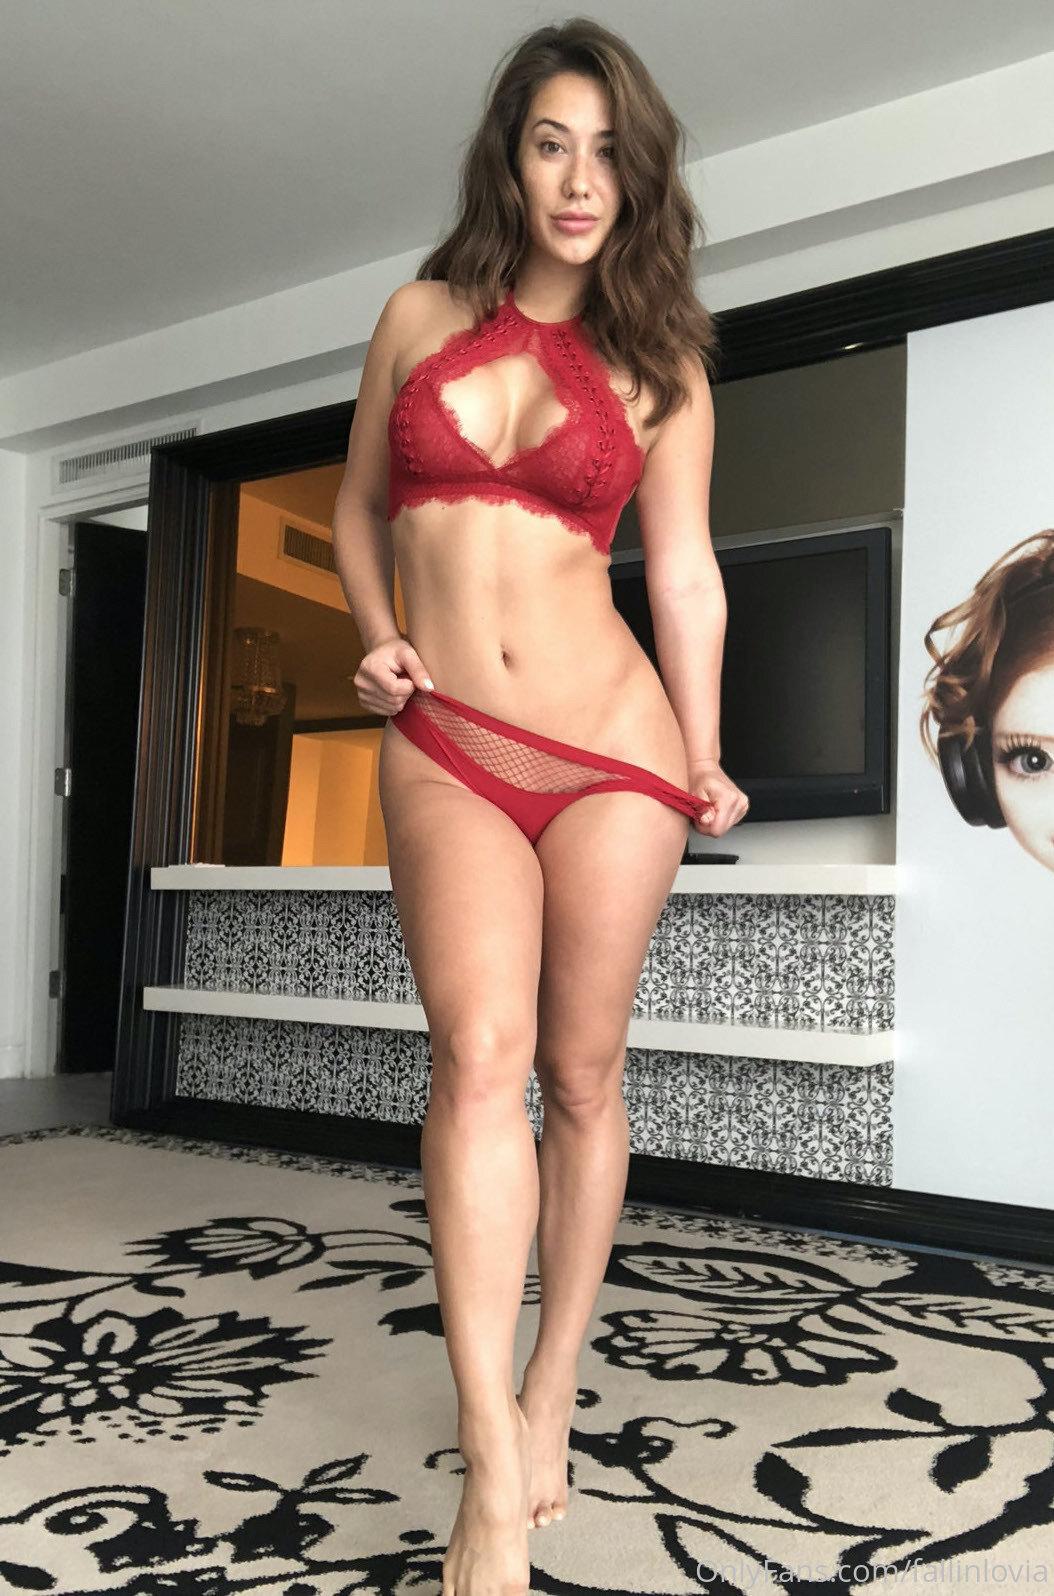 Eva Lovia, Fallinlovia, Onlyfans 0115